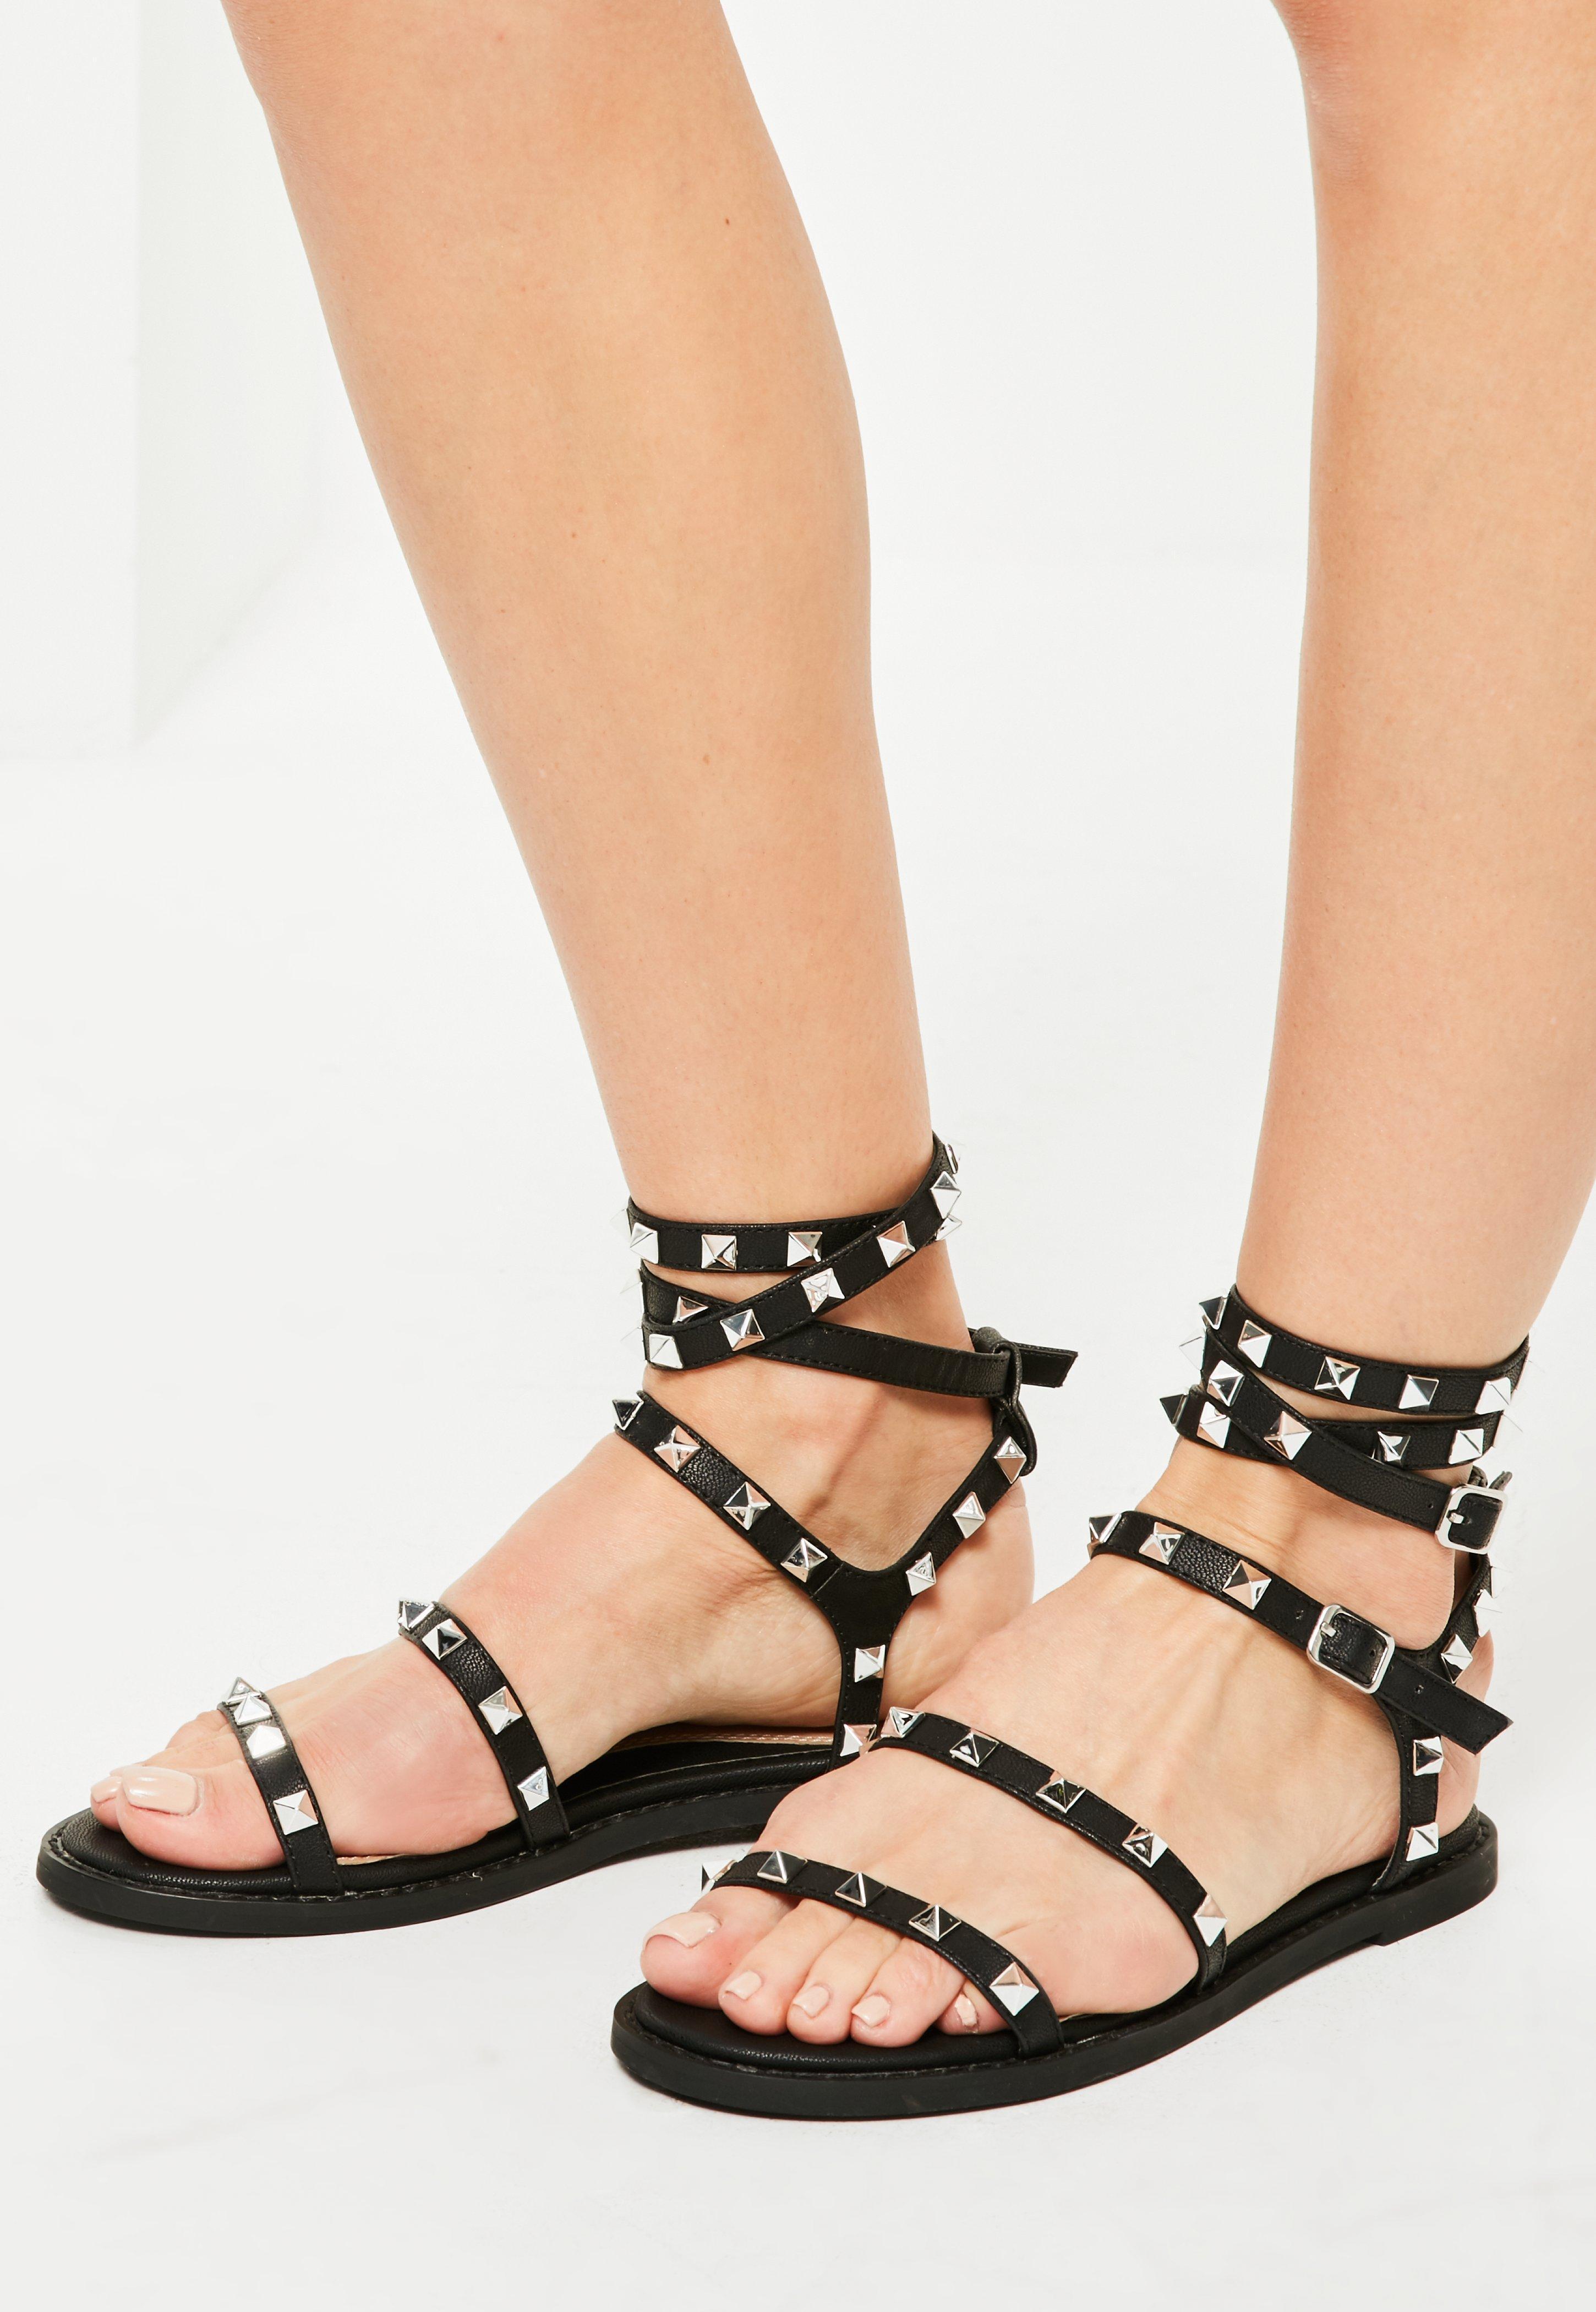 61dbdf8e6688f5 Missguided Black Studded Gladiator Sandals in Black - Lyst